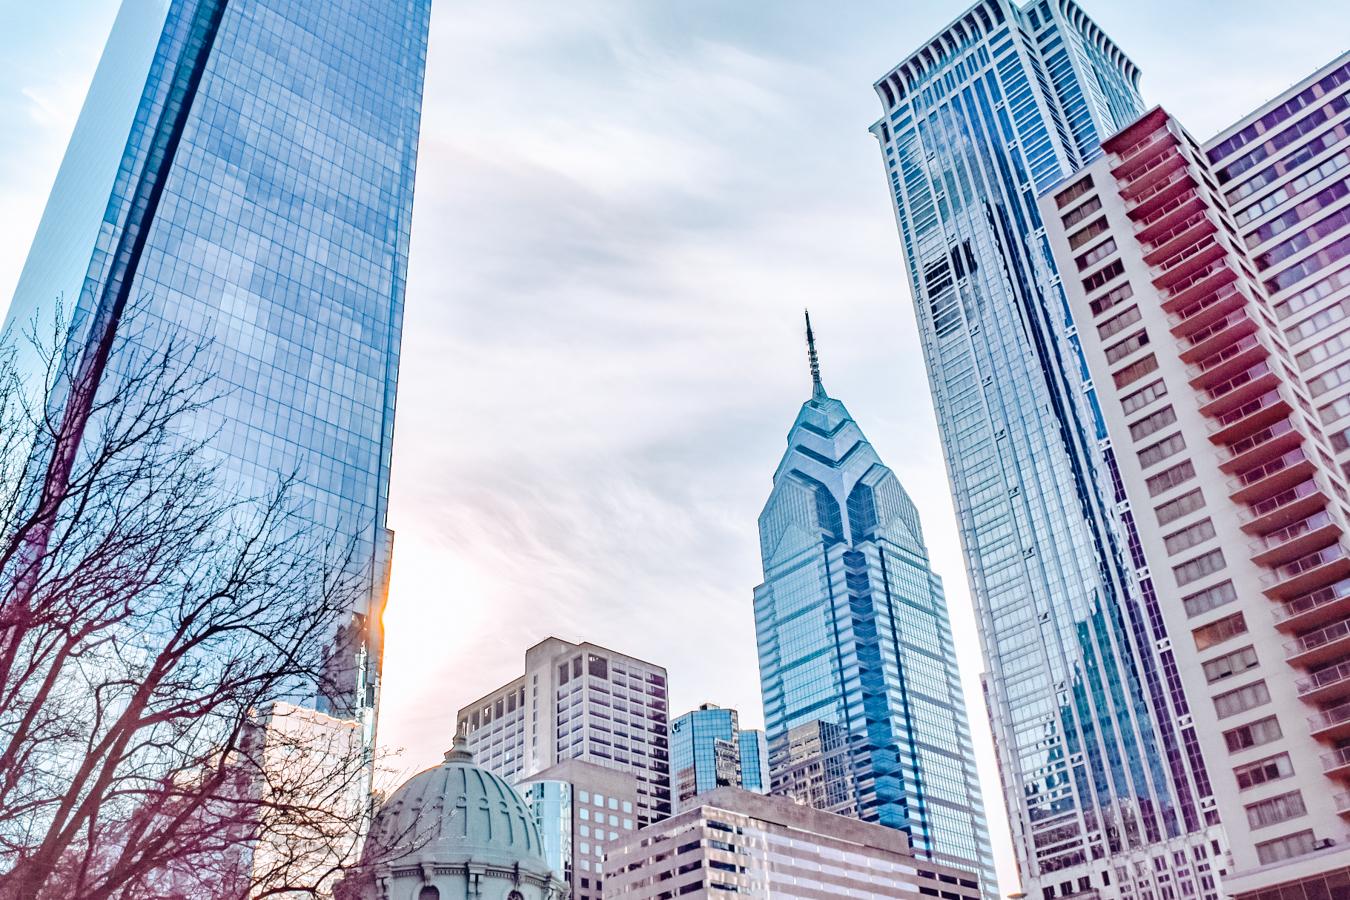 Buildings in the city of Philadelphia